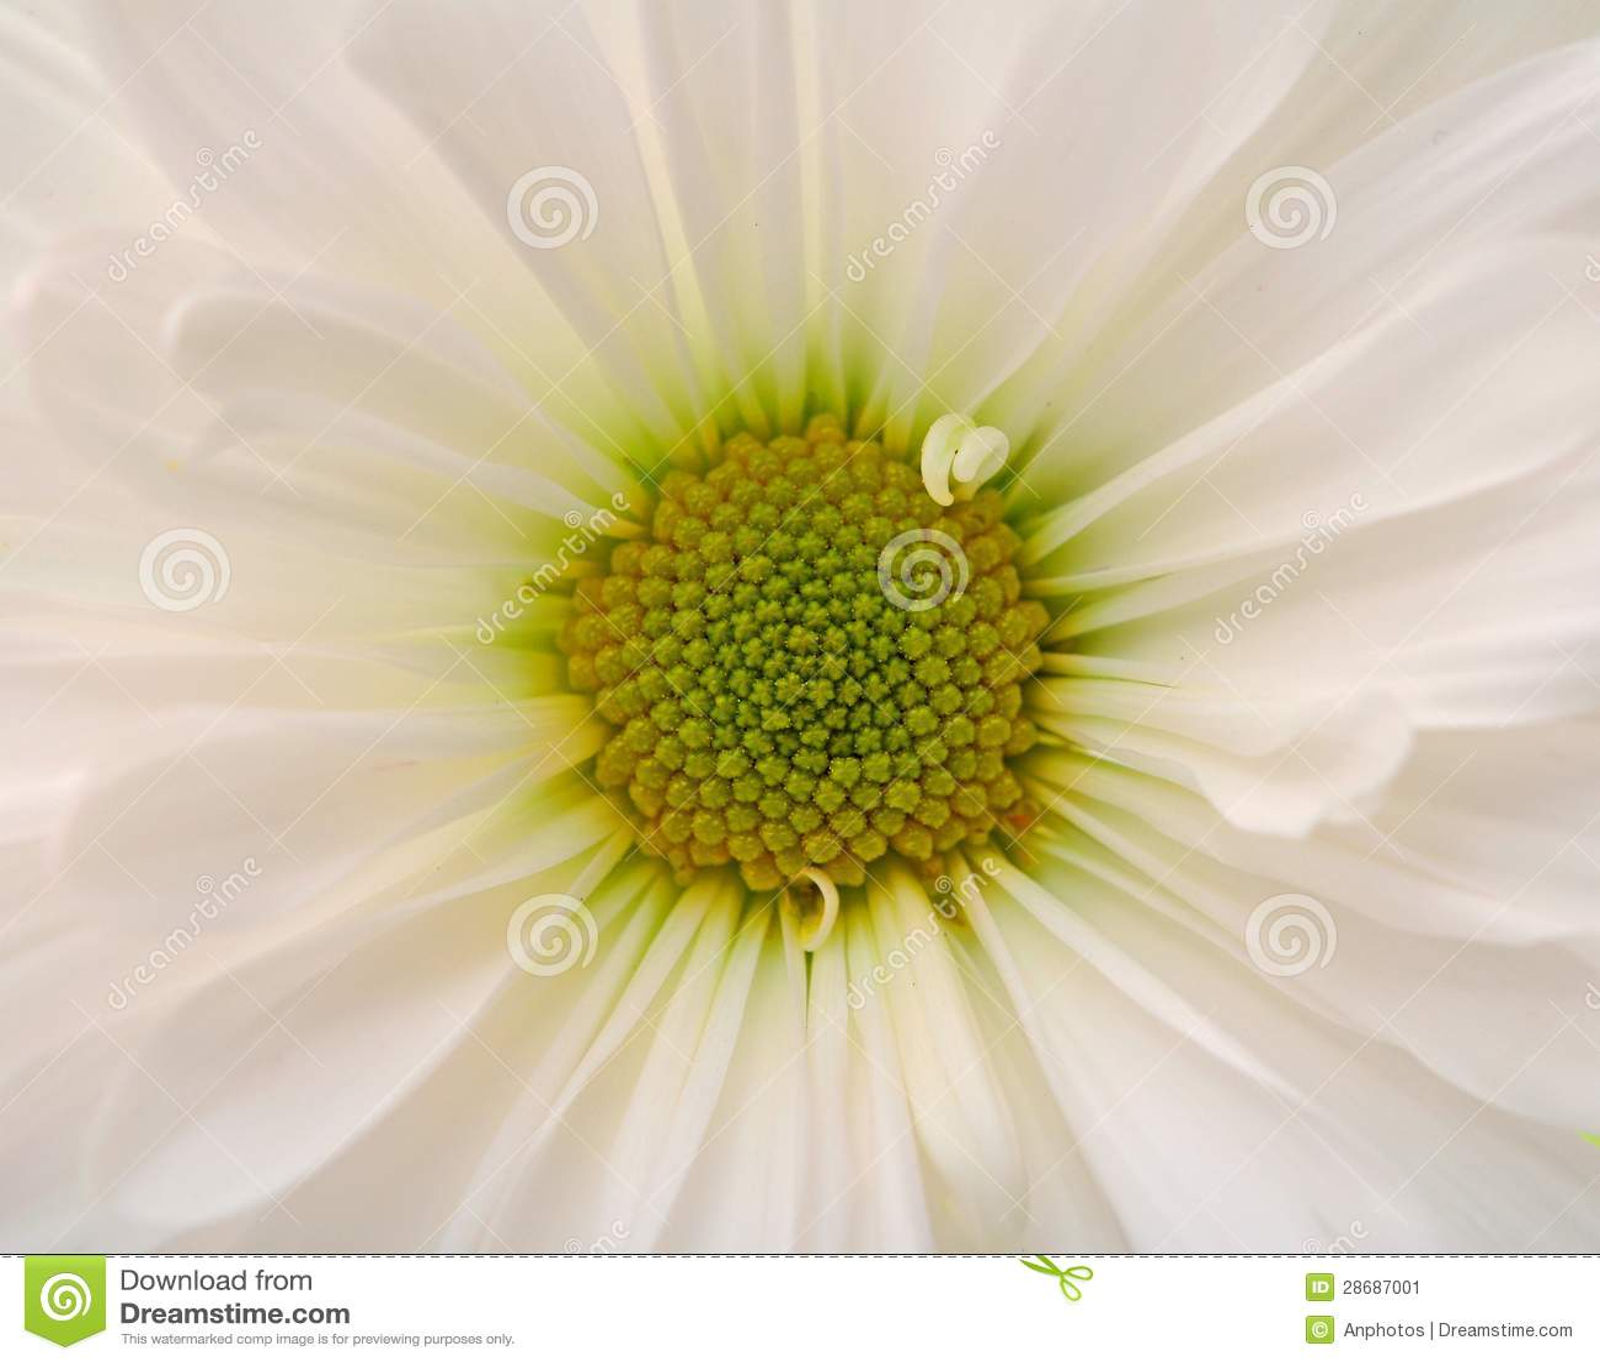 Closeup of white daisy flower stock image image of single floral closeup of white daisy flower izmirmasajfo